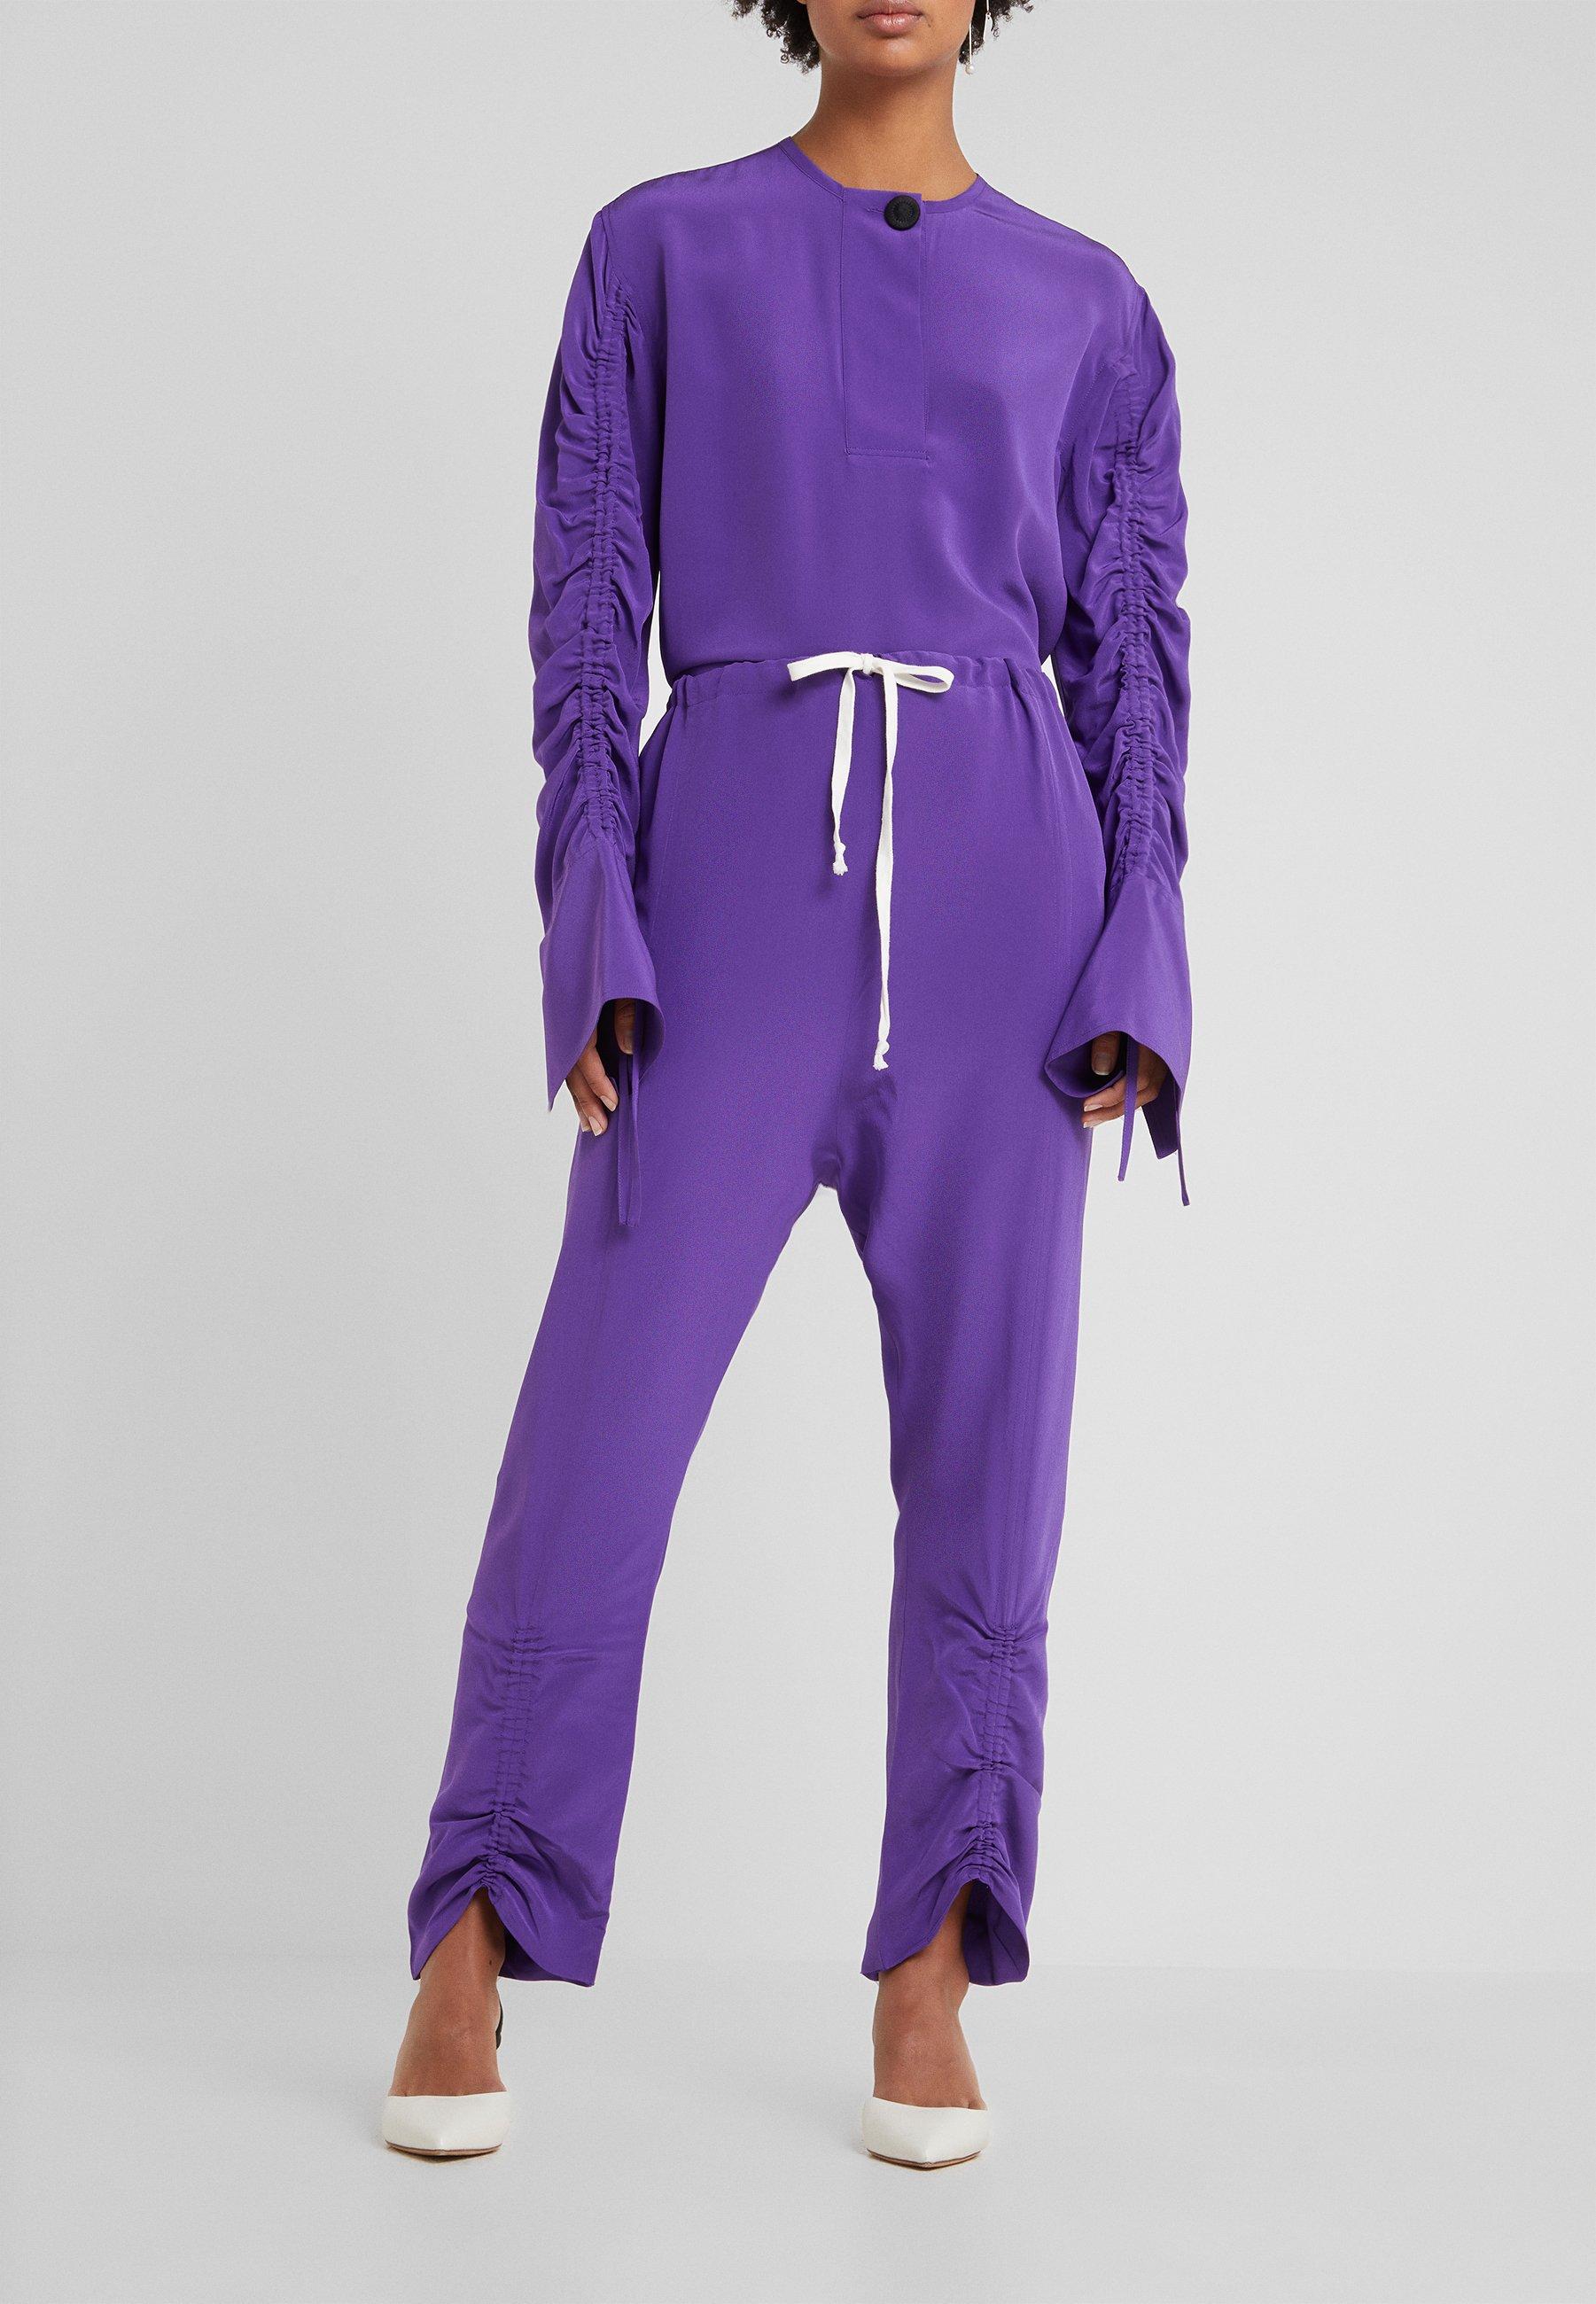 Naisten alennetut violetit housut netistä | Zalando ALE